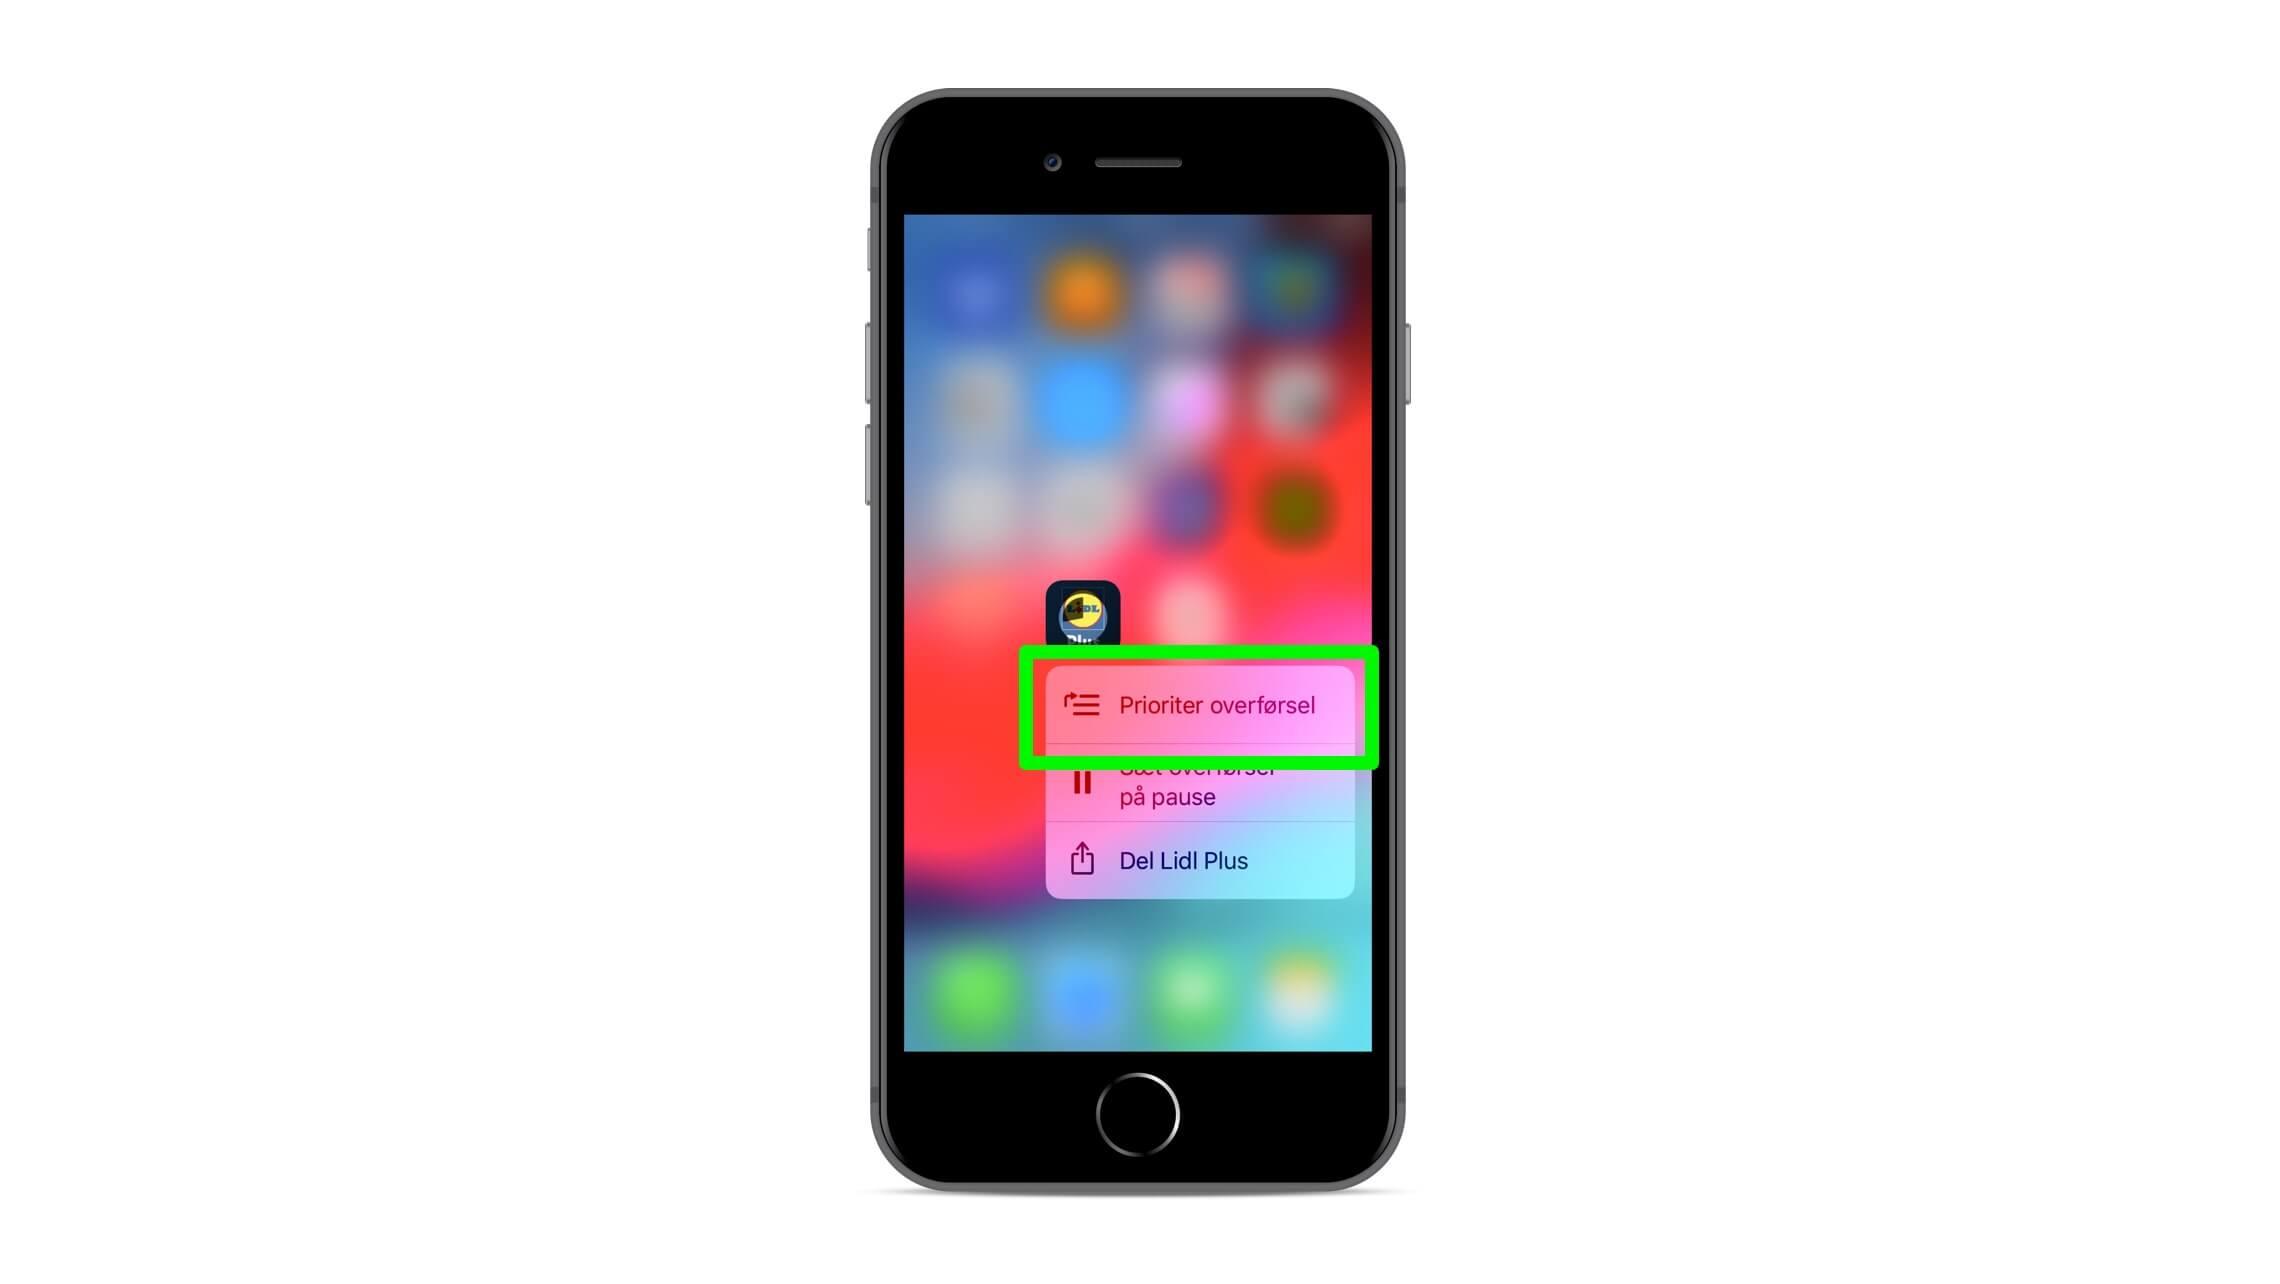 Opdatering af iphone